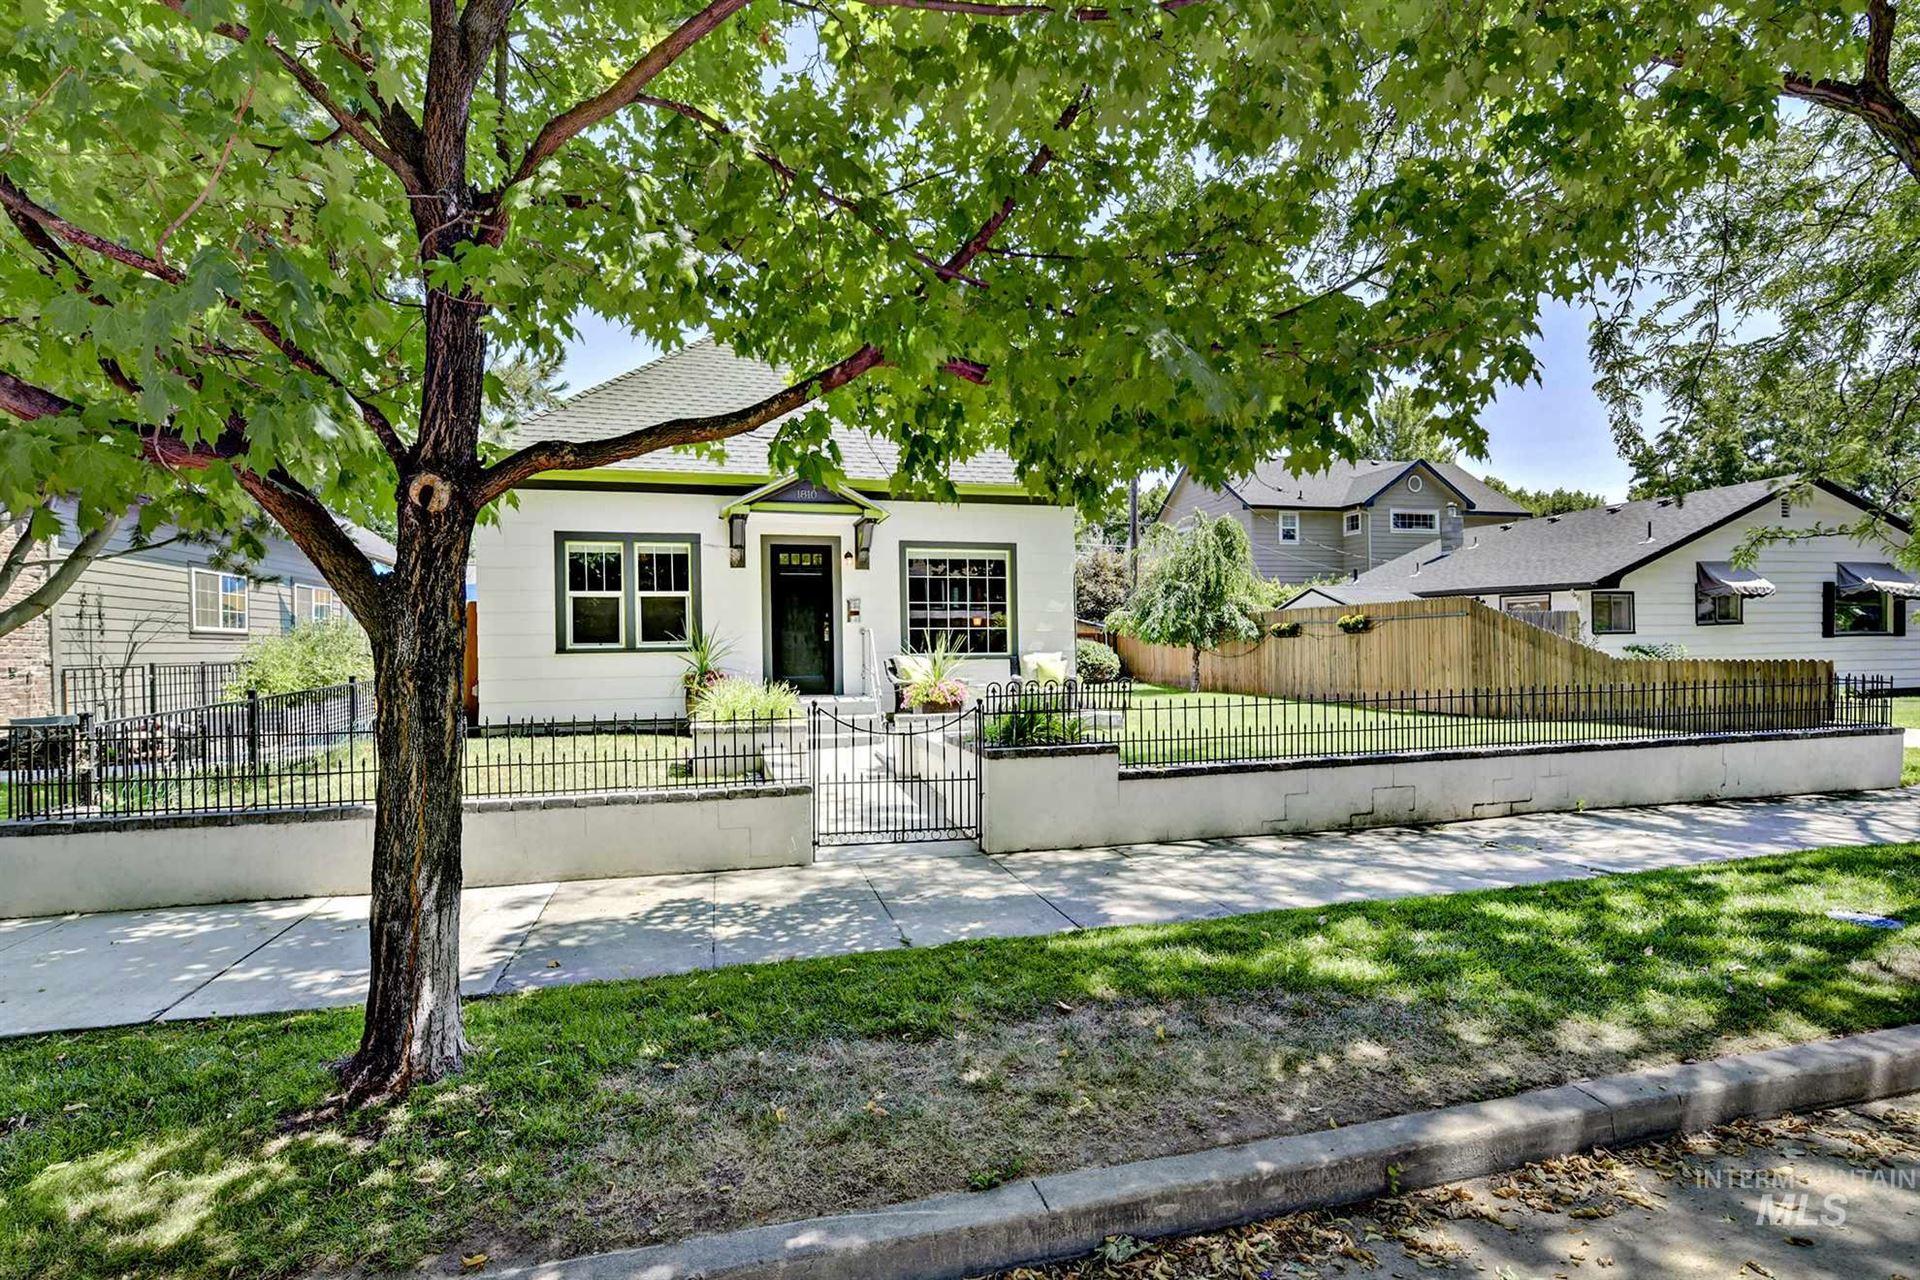 1810 N 10th Street, Boise, ID 83702 - MLS#: 98776224